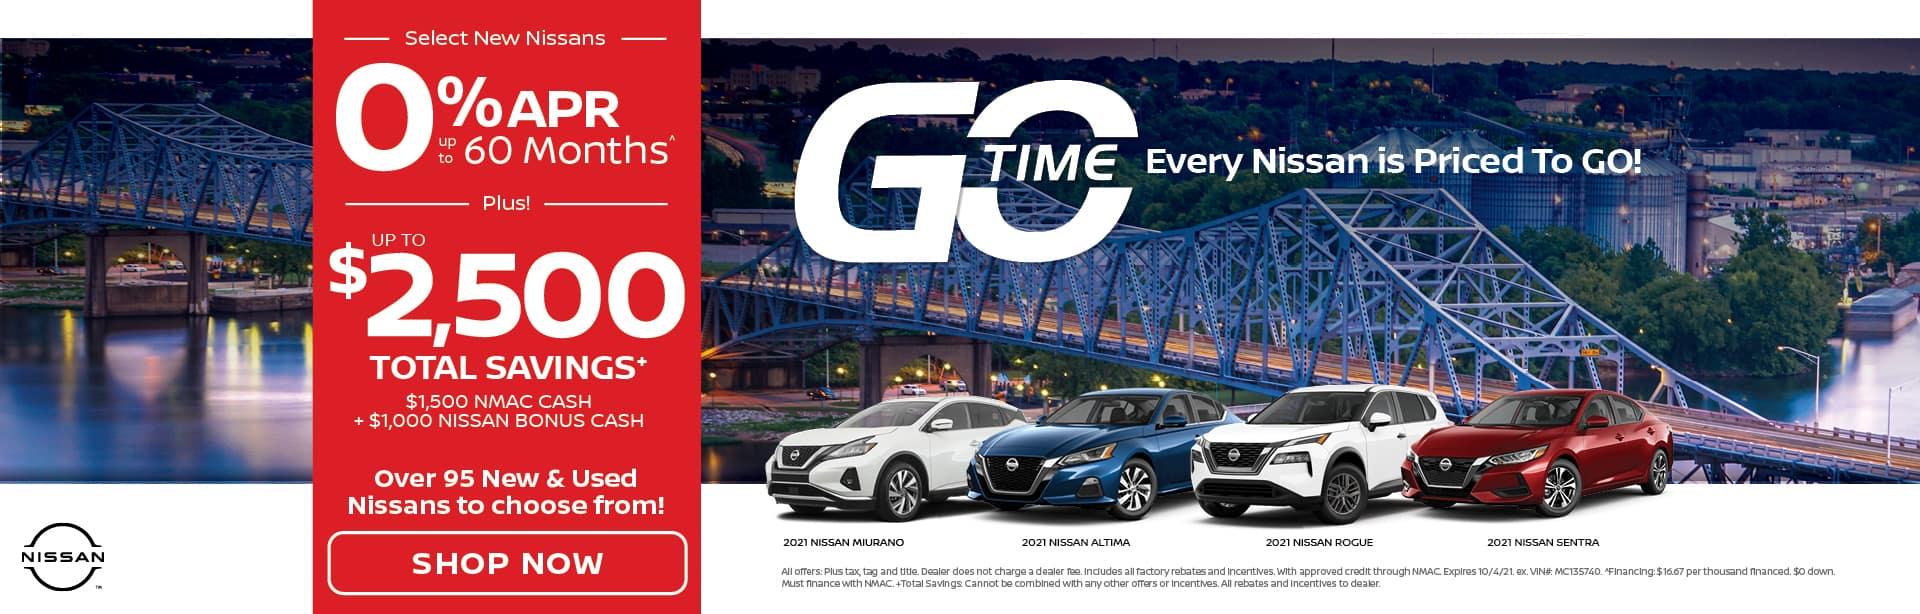 Go Time New Nissans